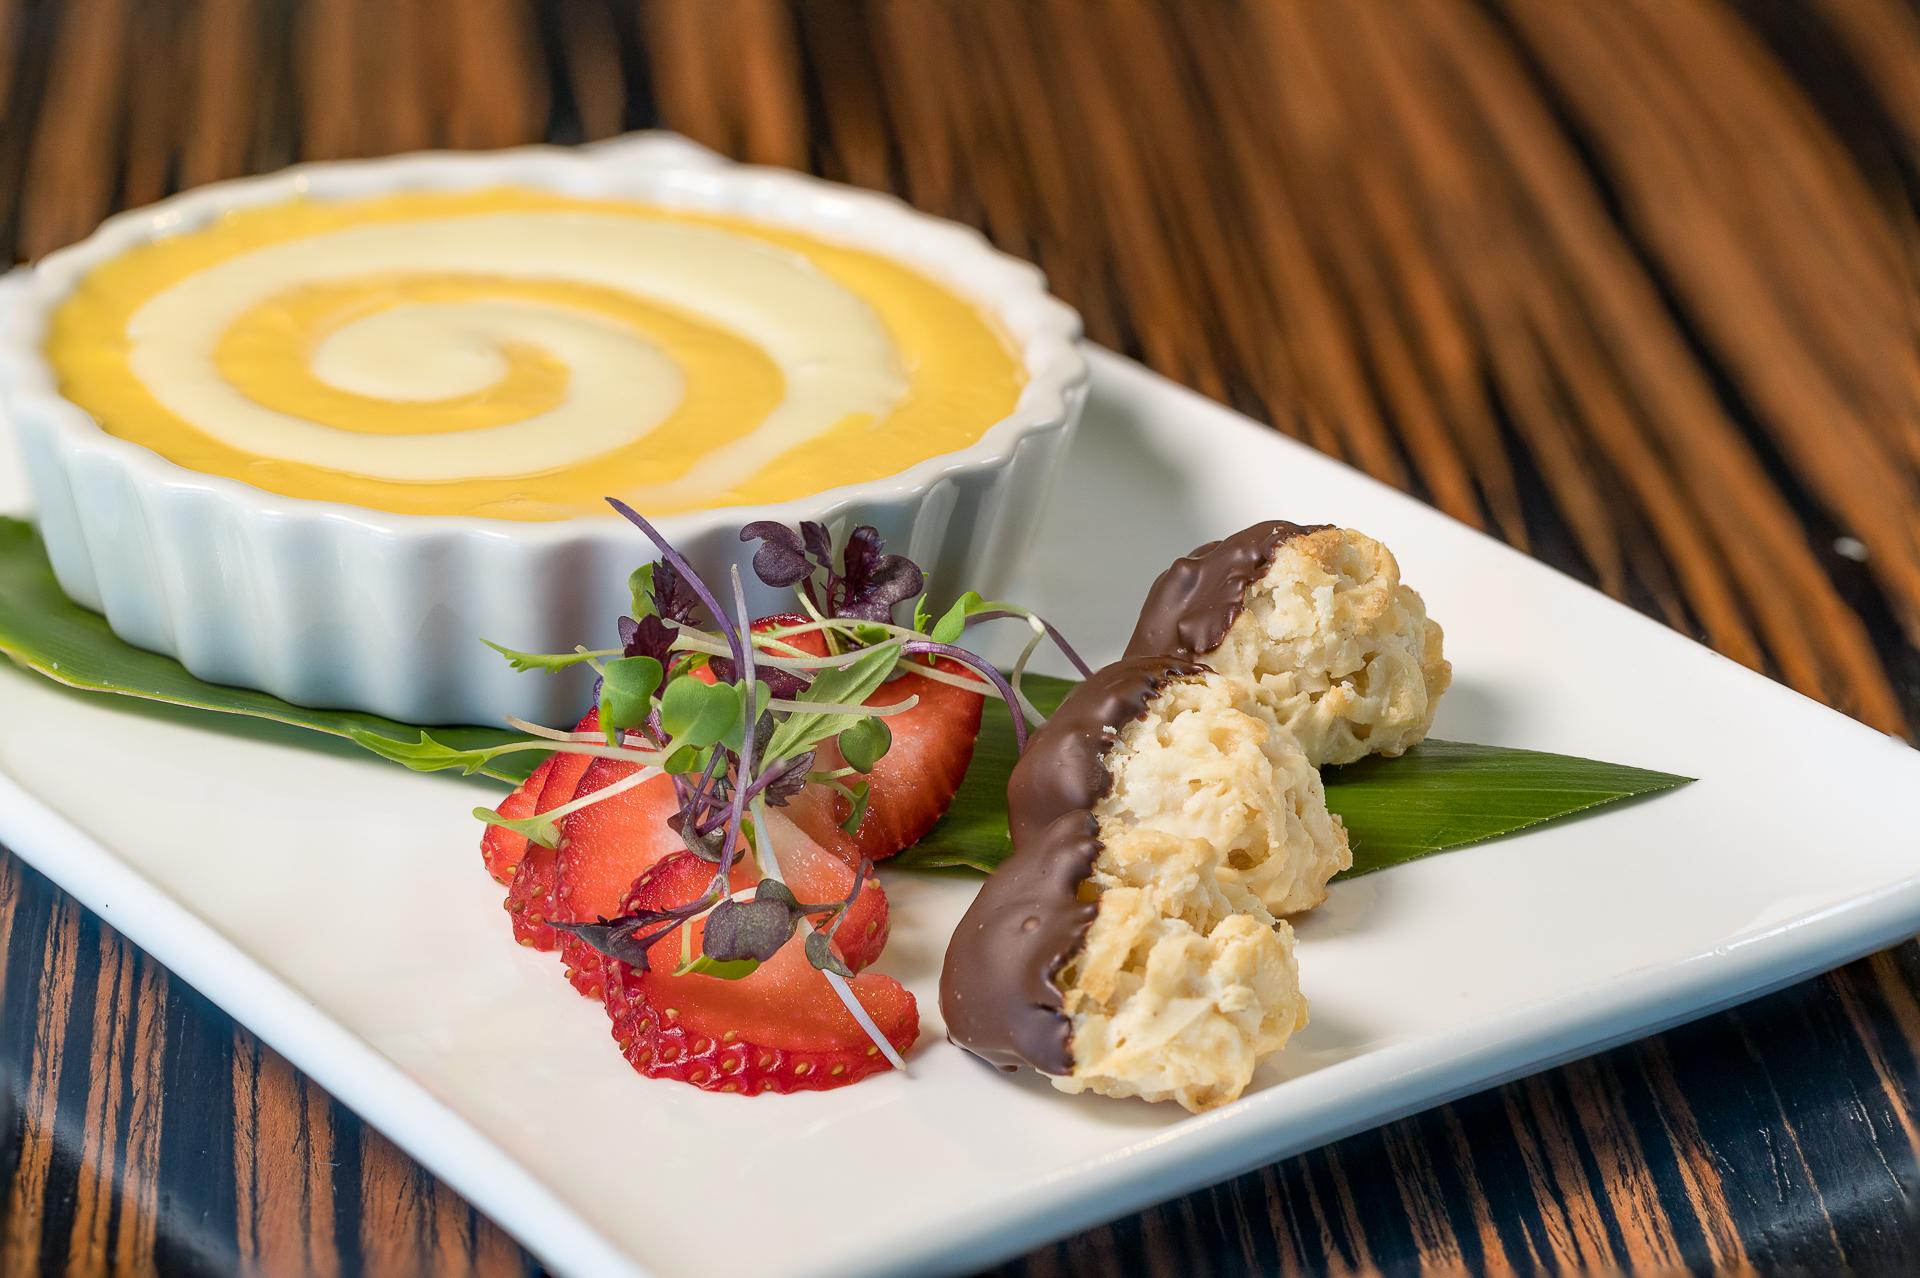 Roy's Kaanapali_Lilikoi key lime pie with coconut macaroons __pc Craig Bixel_20200104-06.jpg